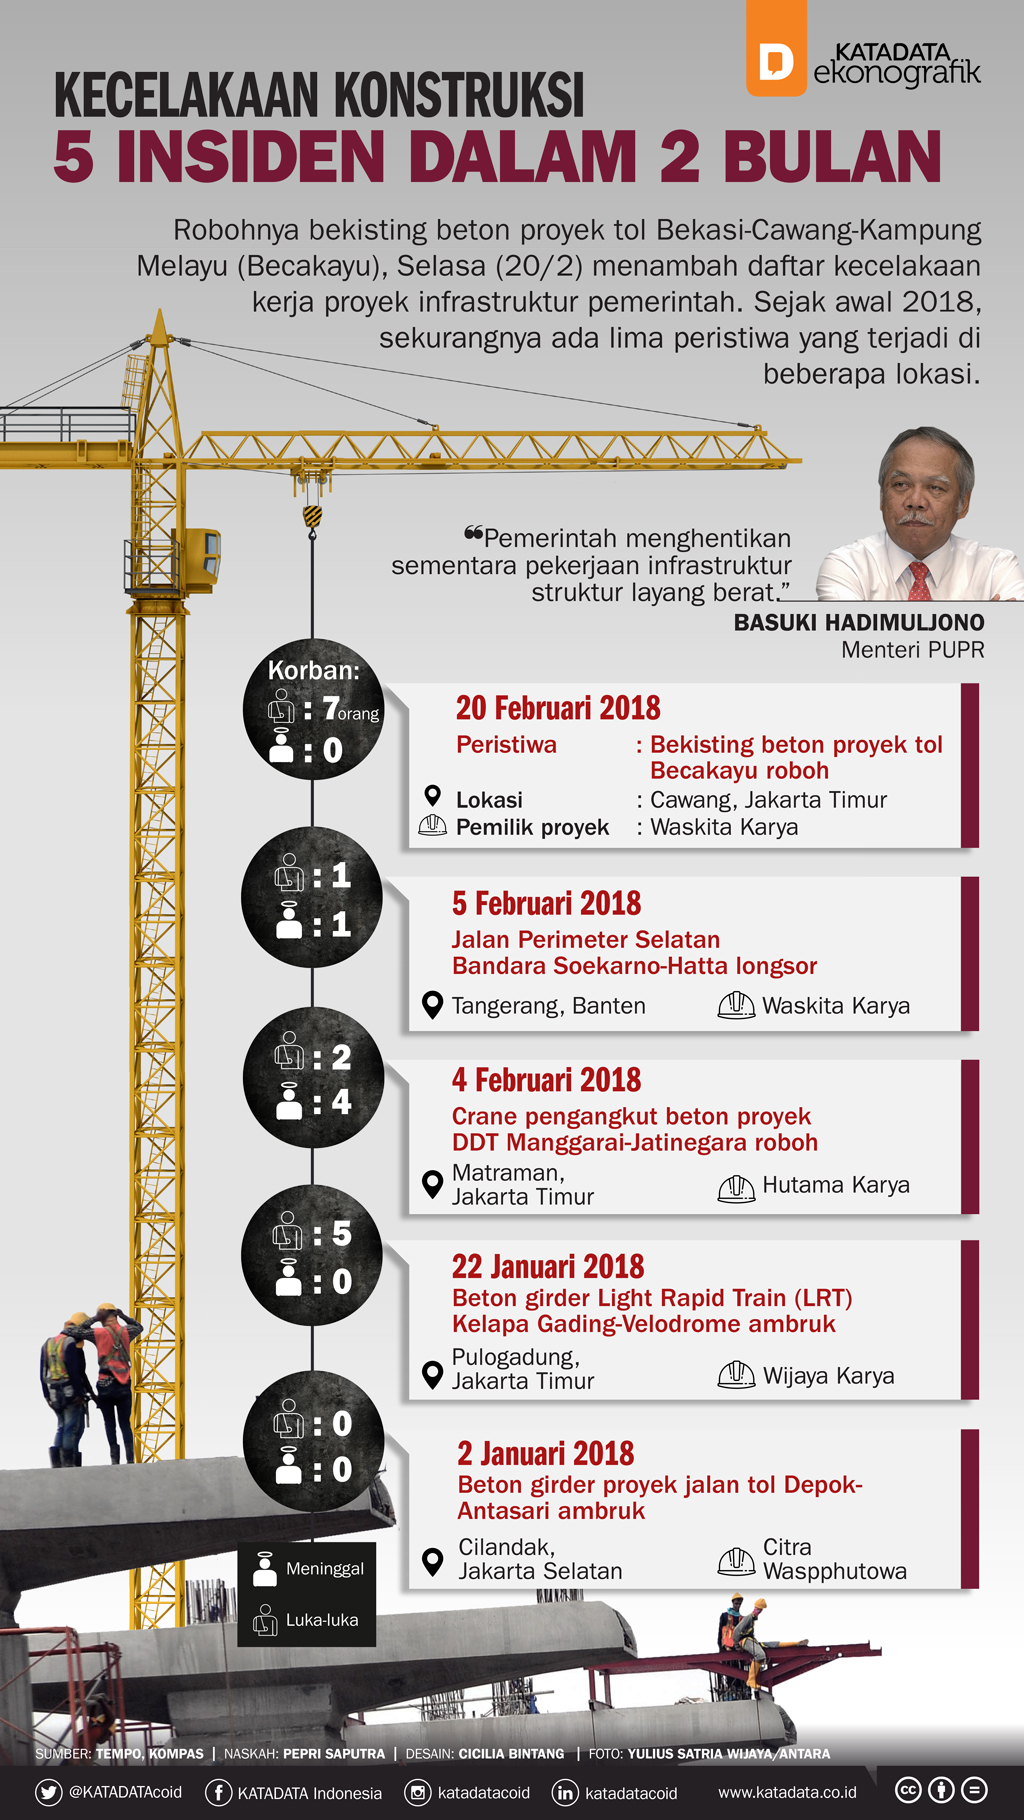 5 Insiden Kecelakaan Konstruksi dalam 2 Bulan